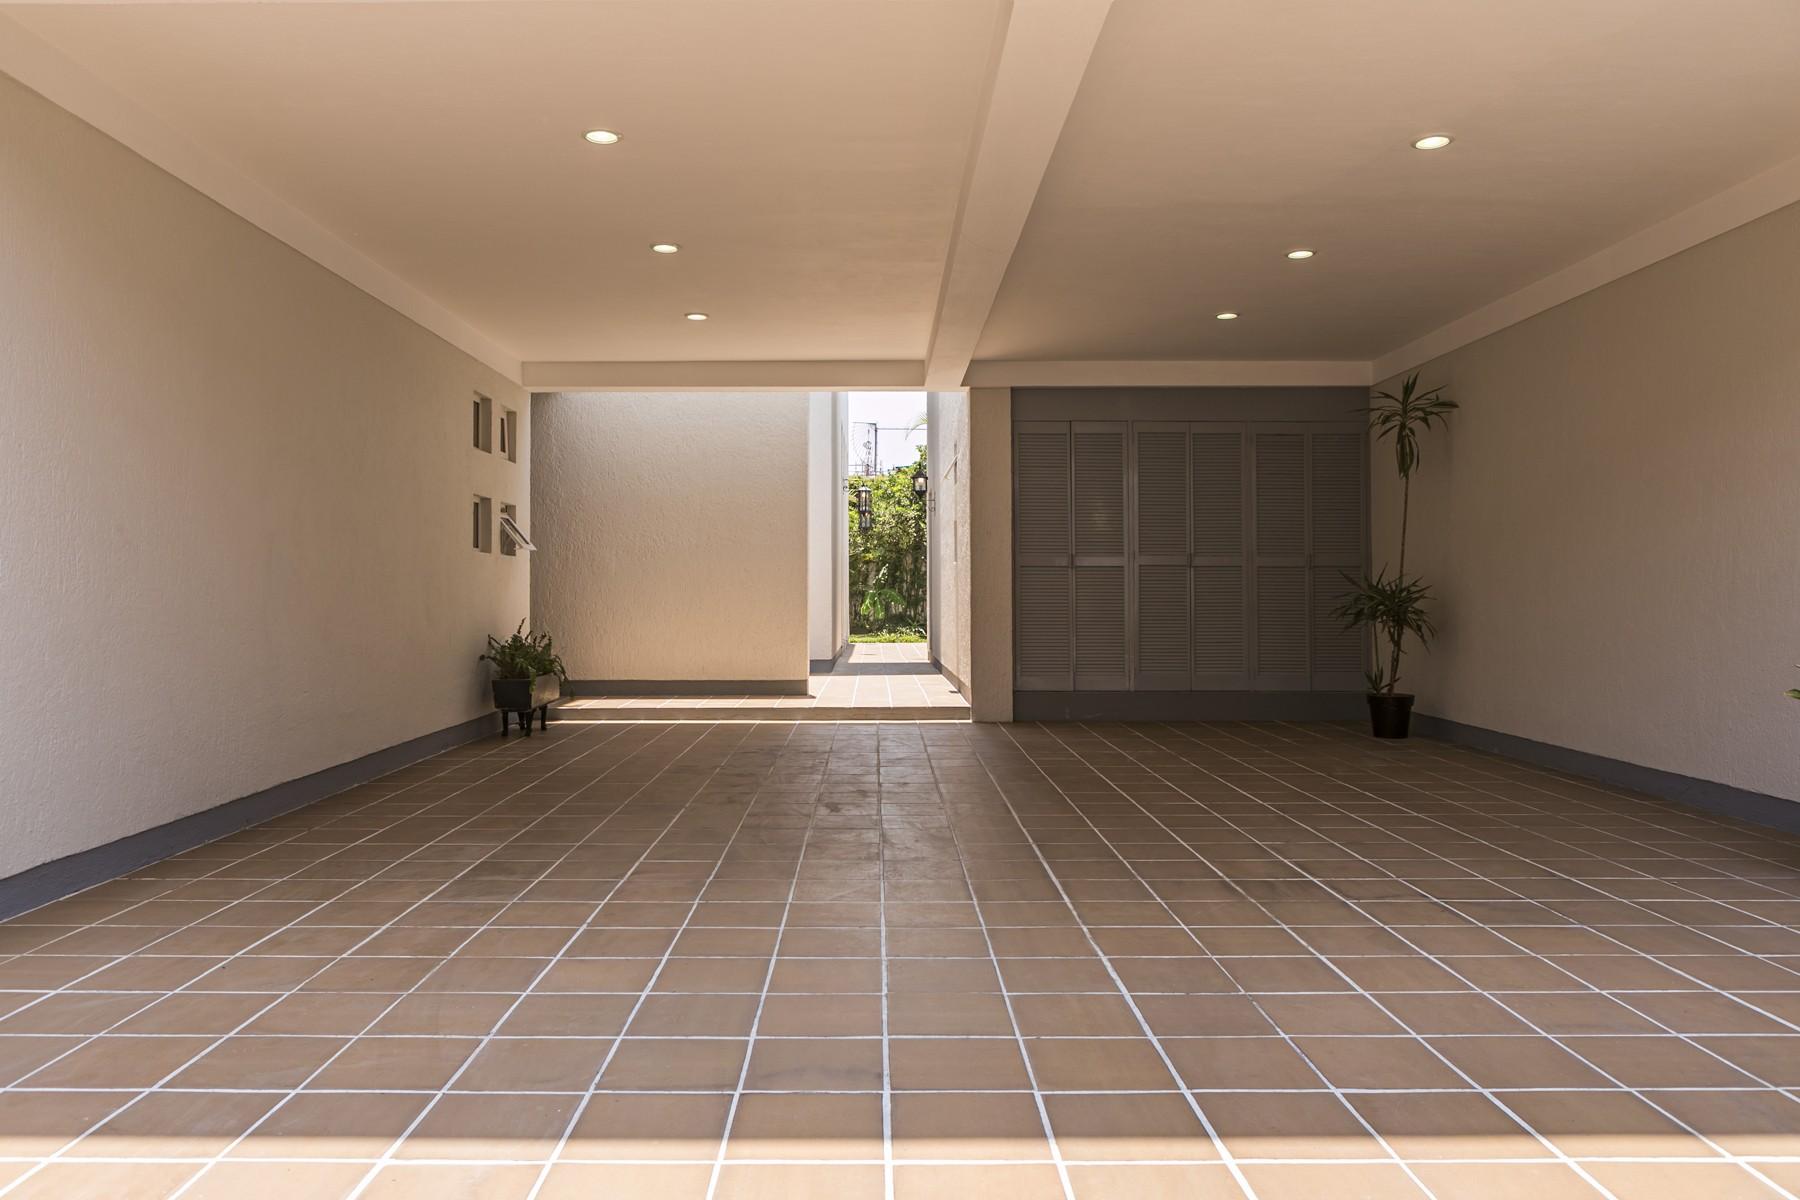 Additional photo for property listing at Casa Prisciliano Calle Prisciliano Sánchez 81 Tlaquepaque, Other Areas In Mexico 45500 Mexico